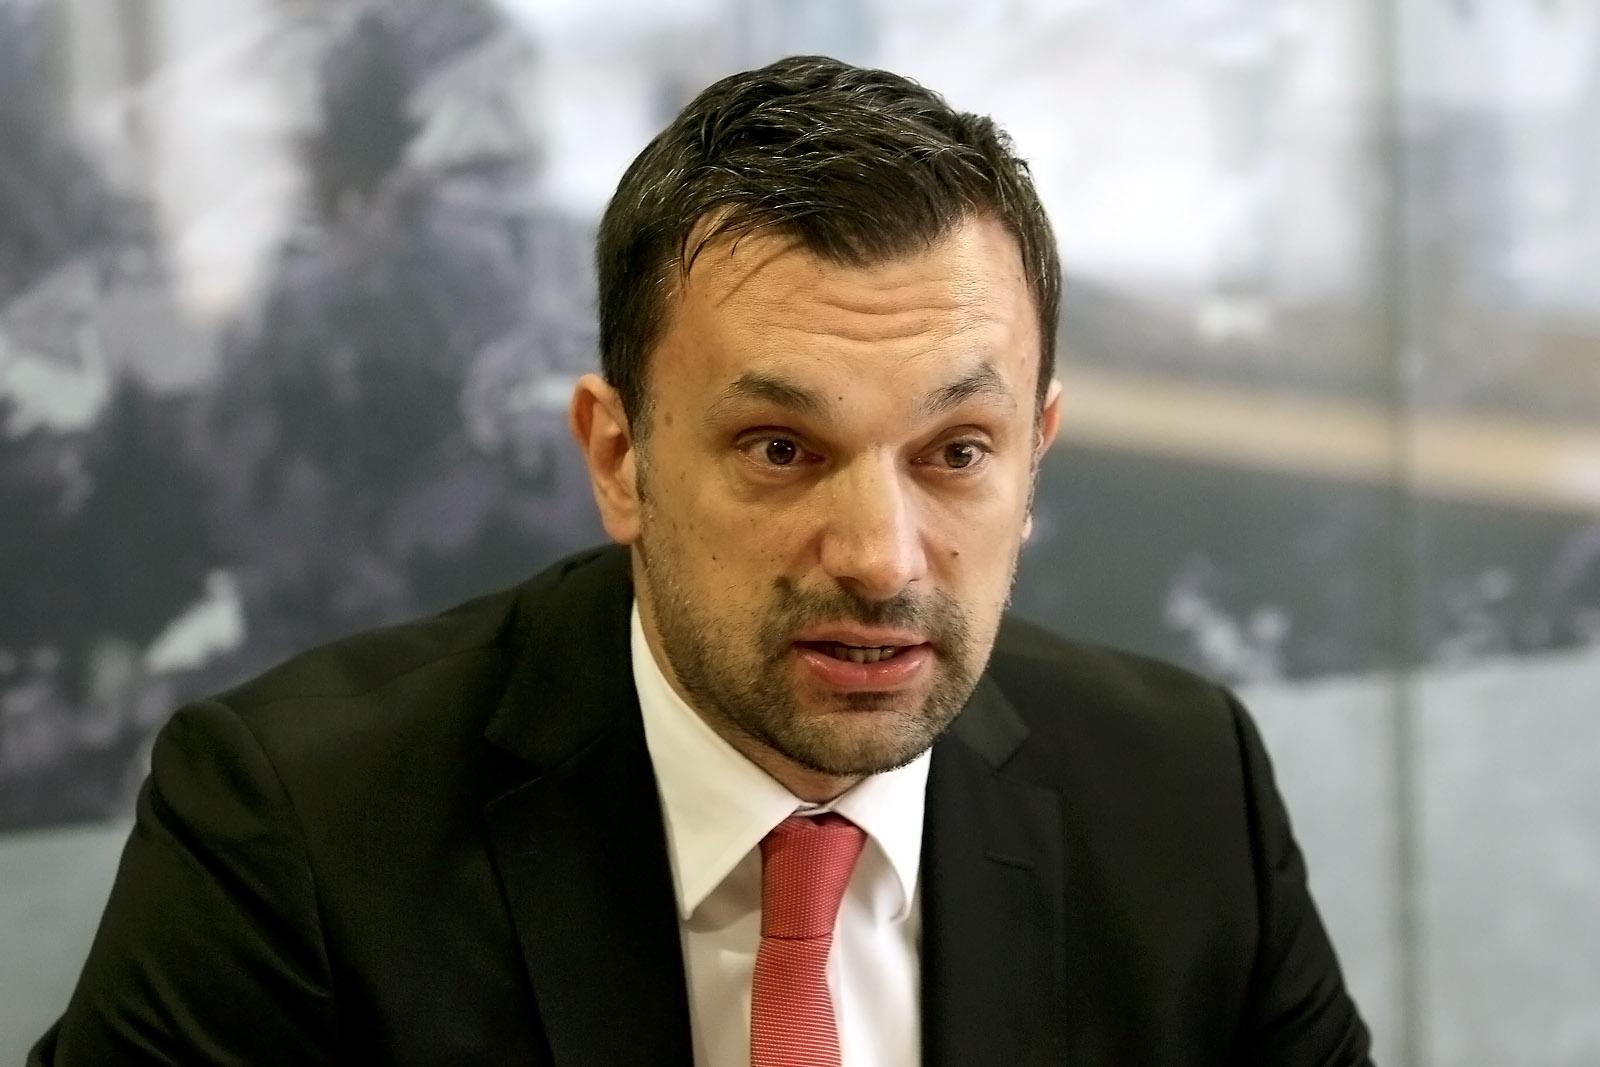 Elmedin Dino Konakovic Premijer Vlada Kanton Sarajevo 03072015 38